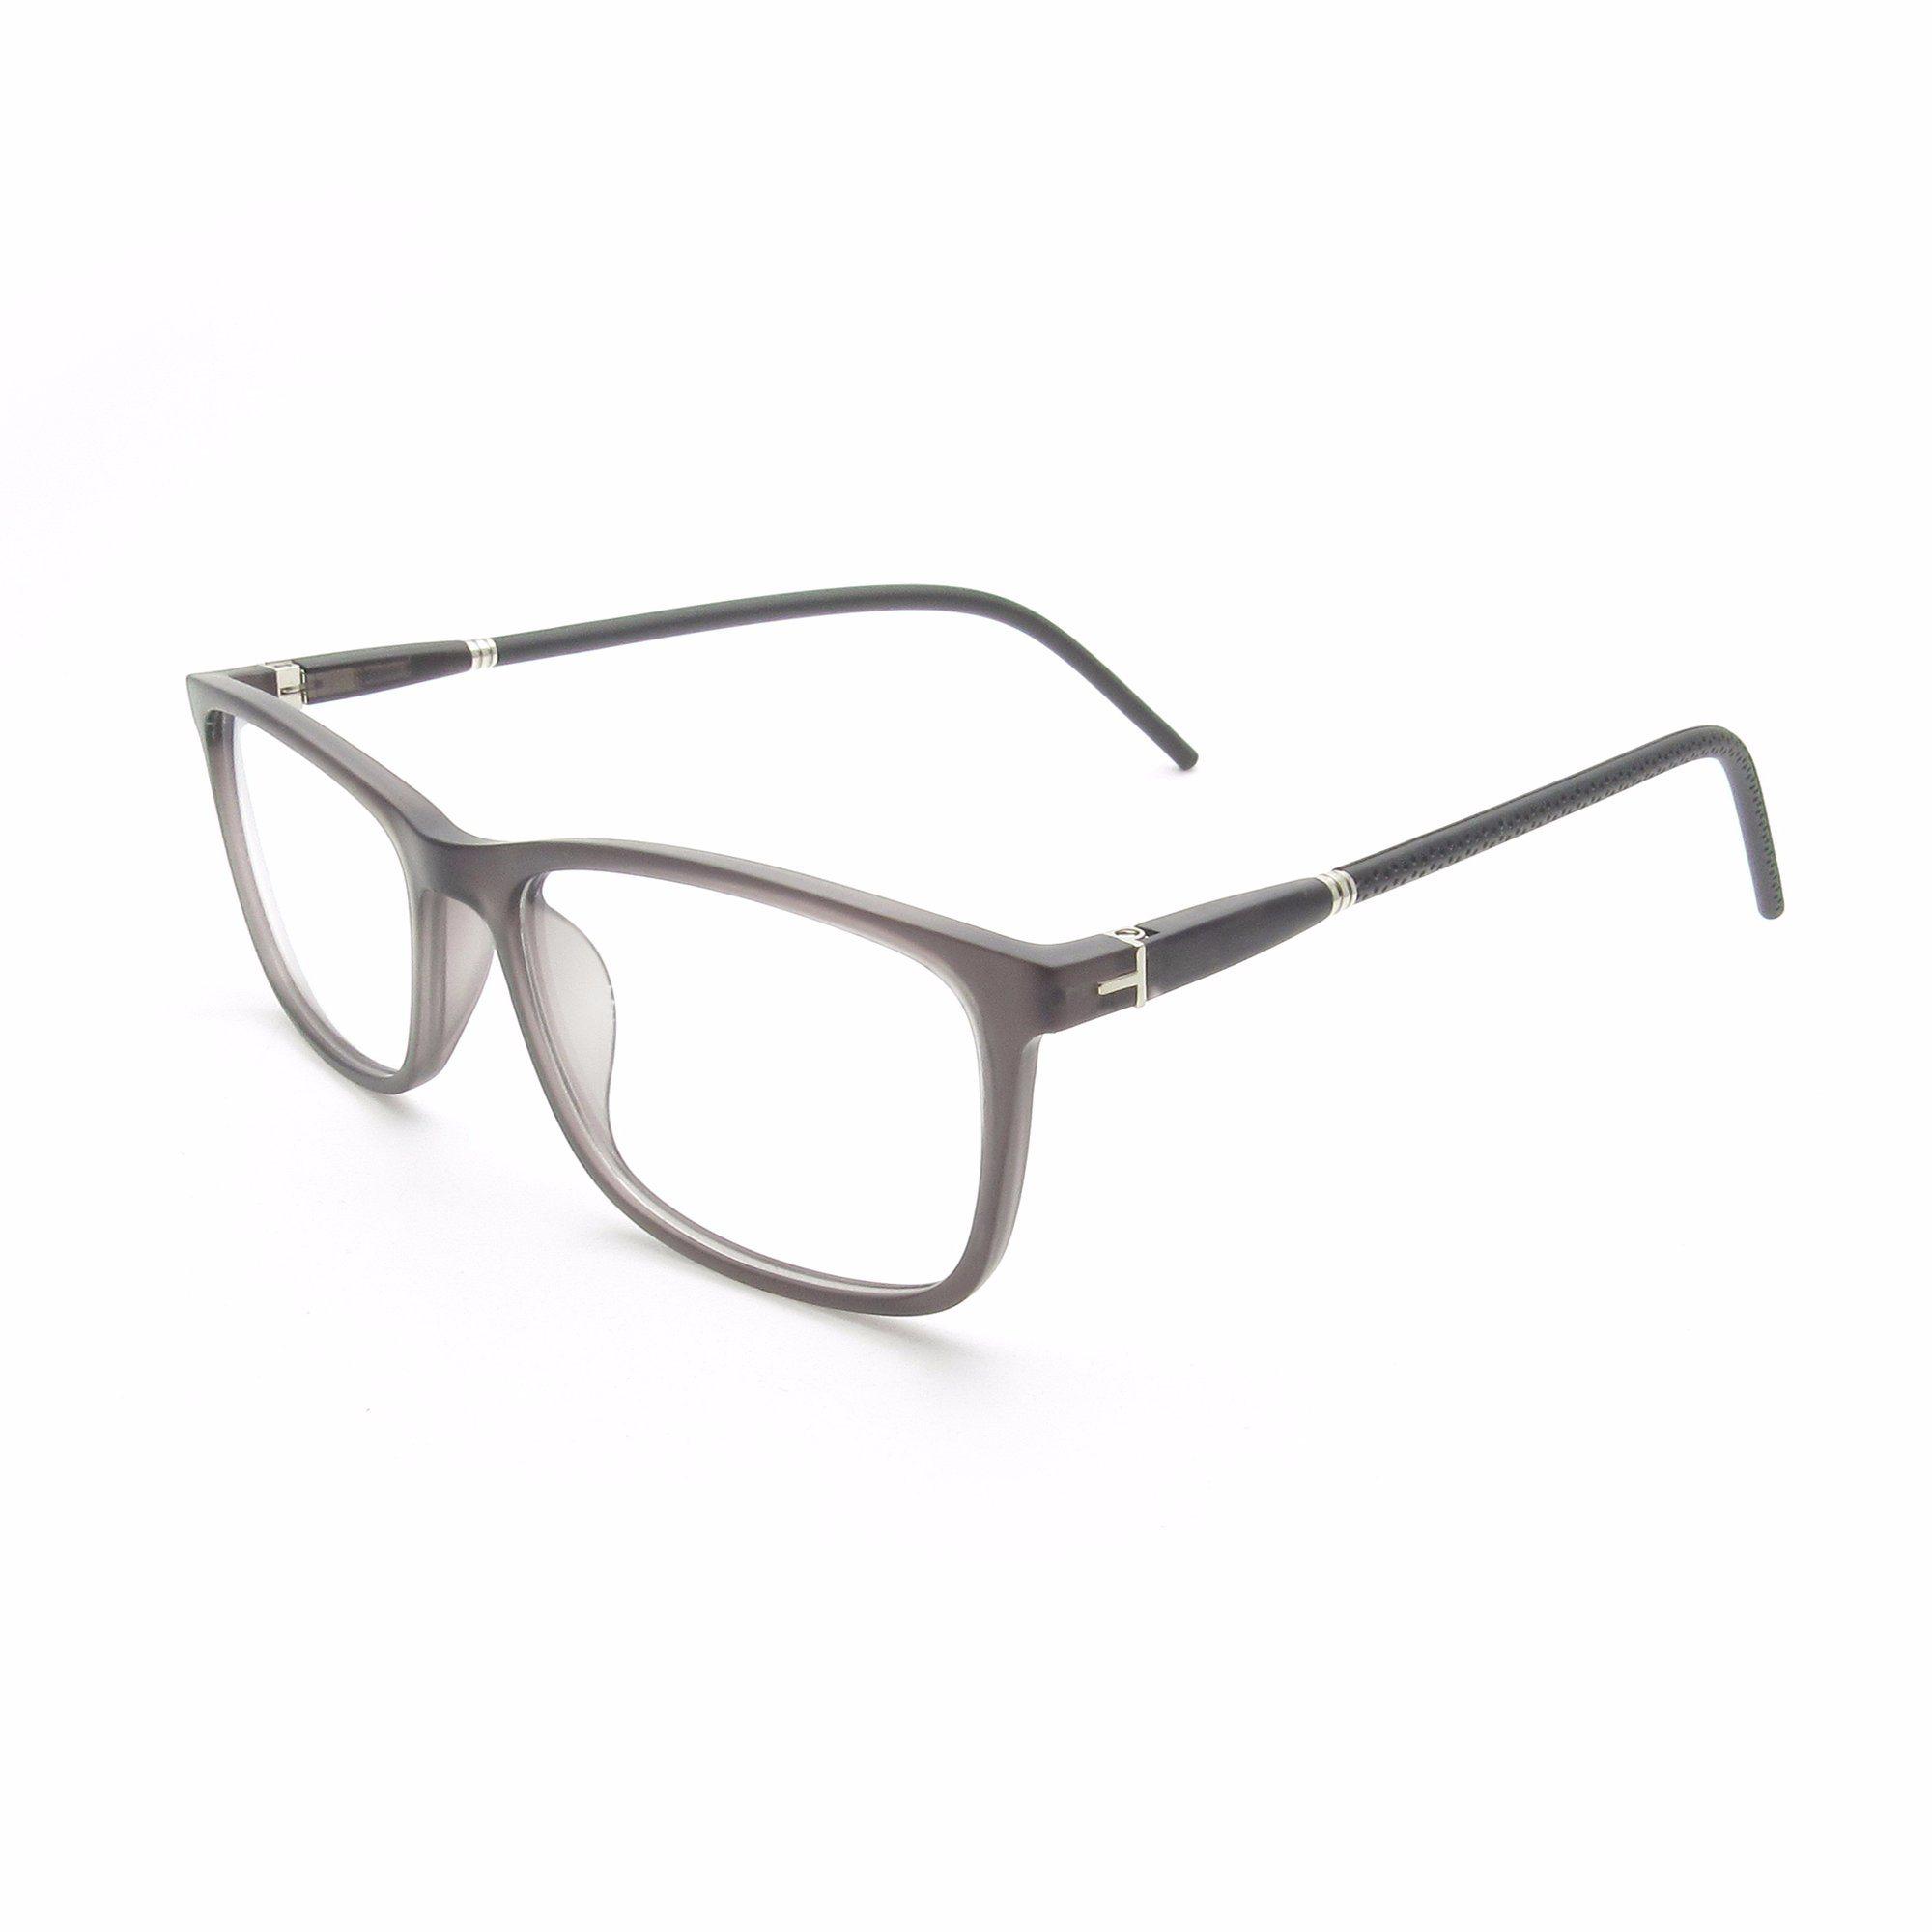 New Design Mz0814 Square Cheap Stainless Steel Reading Eyewear Optical Frames